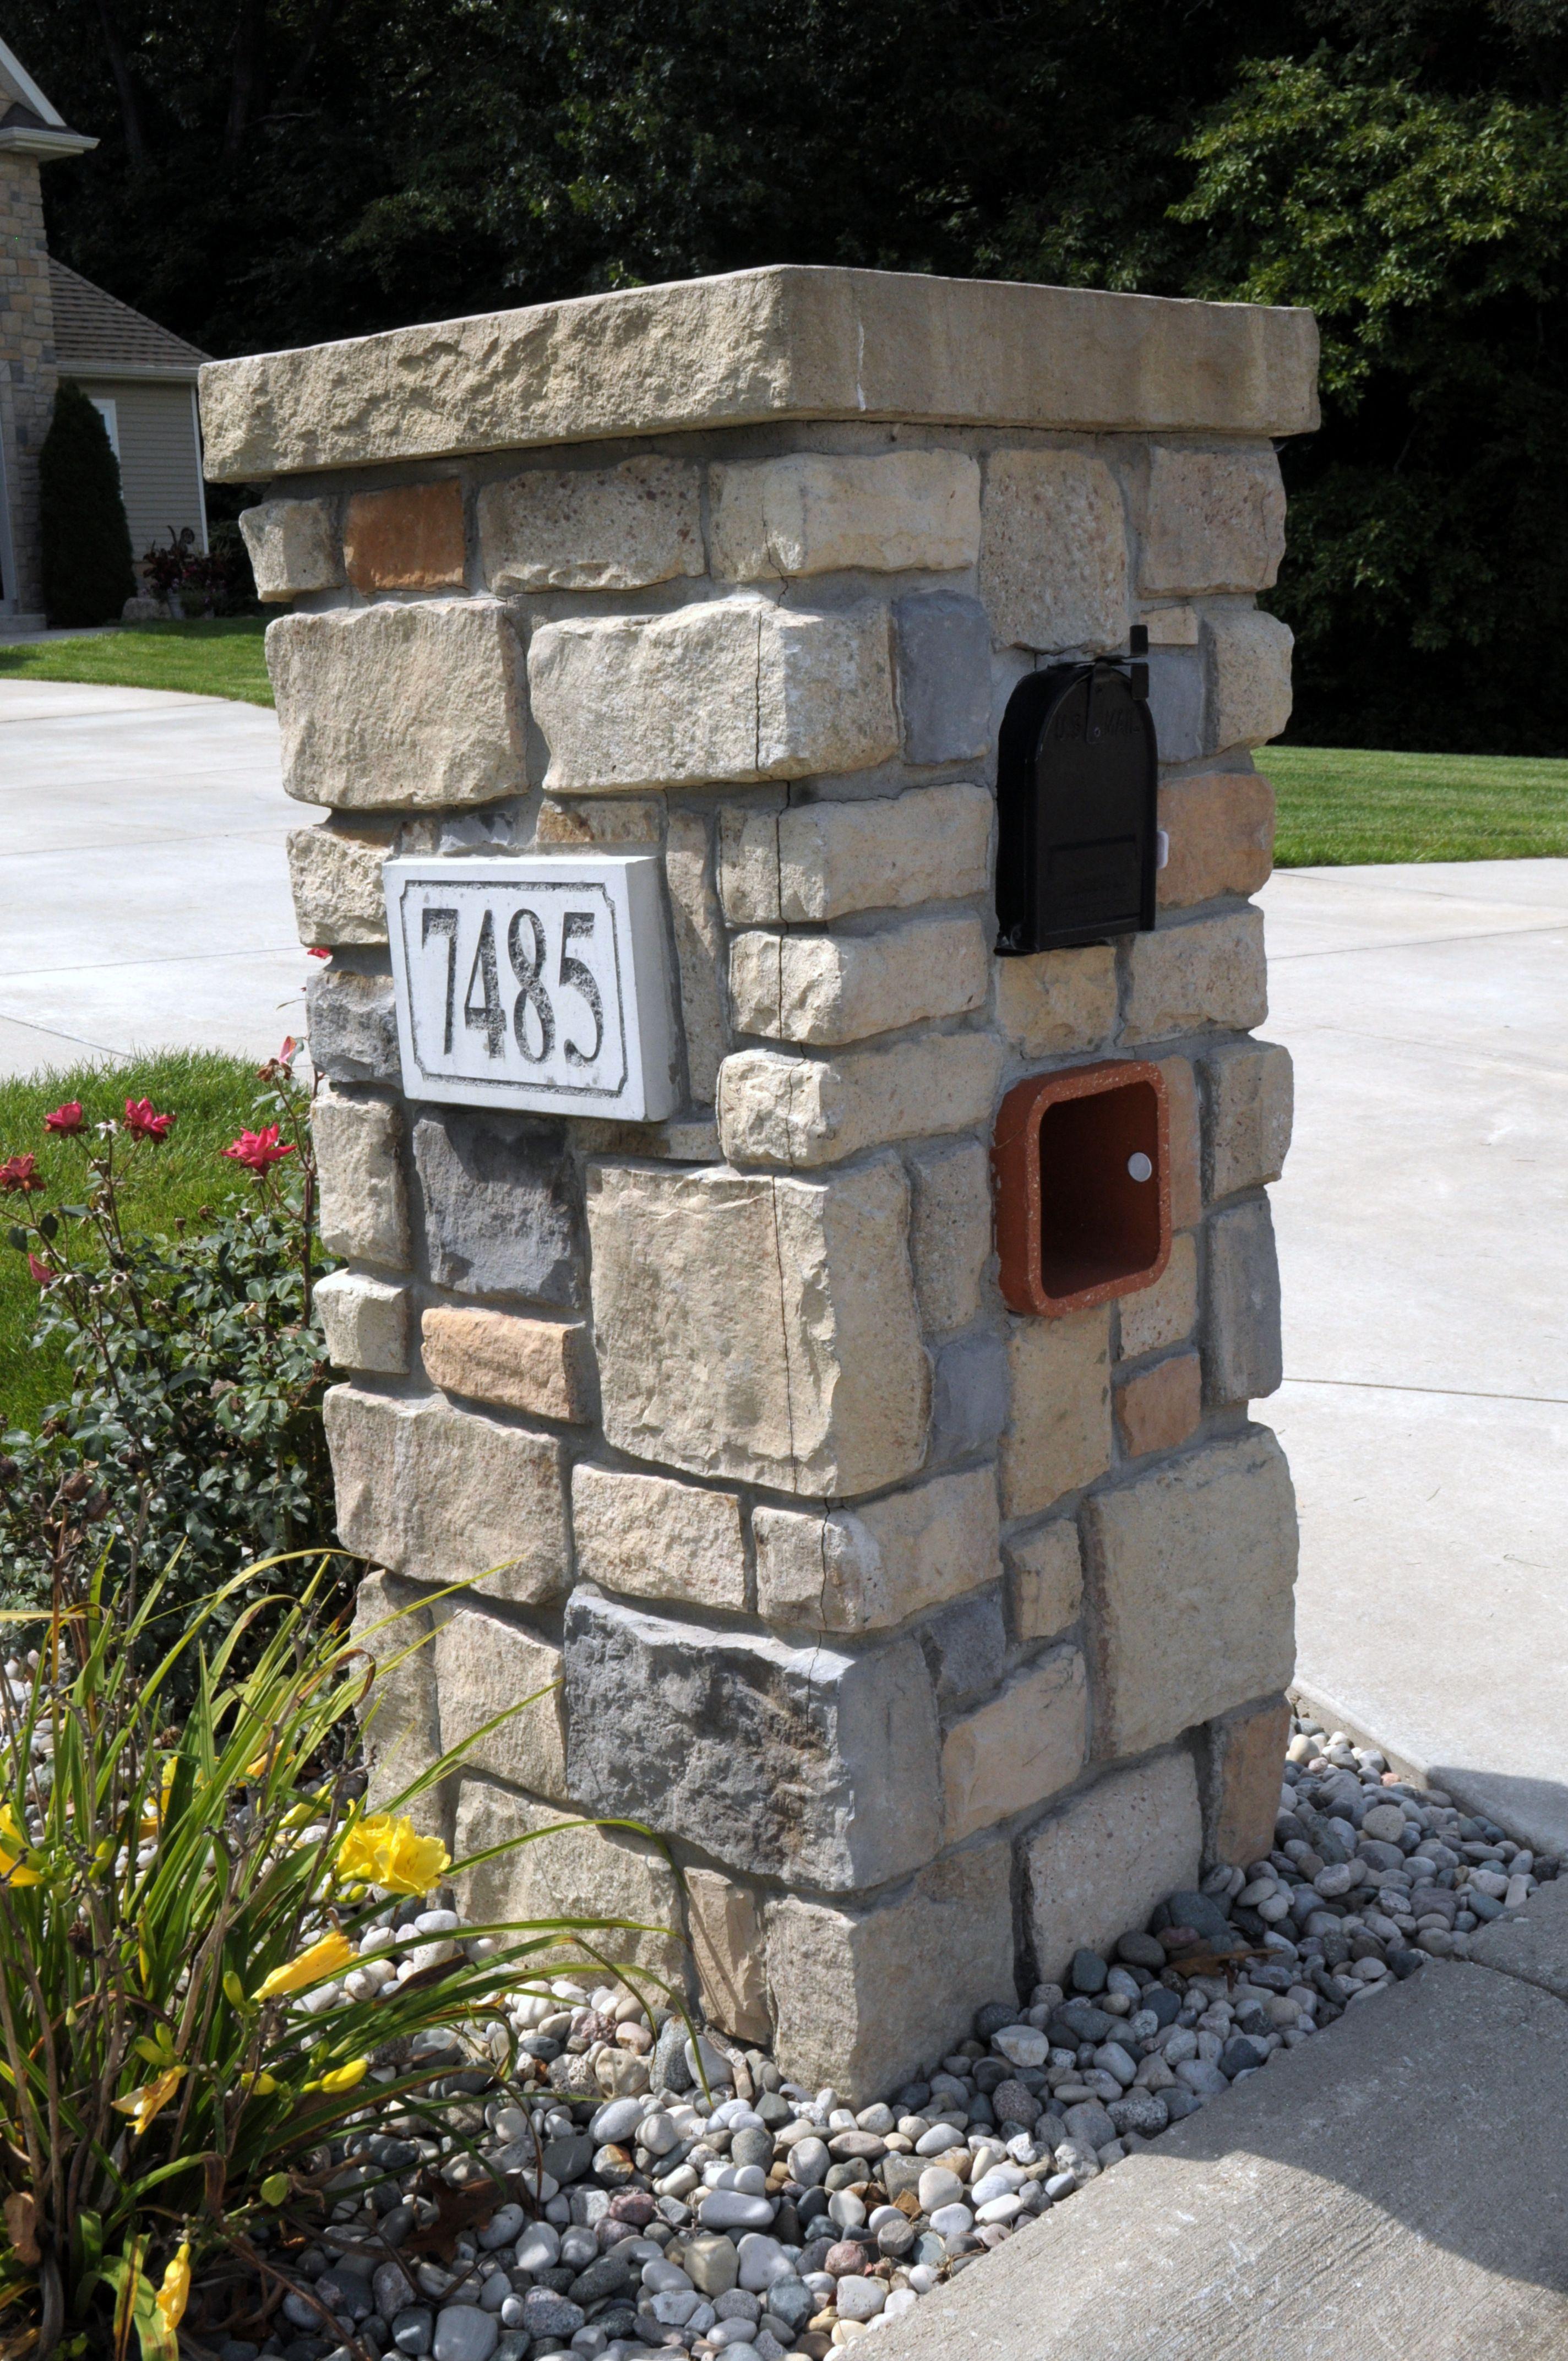 Stoned Mailbox With Engraved Address Block Baugo Creek Cut